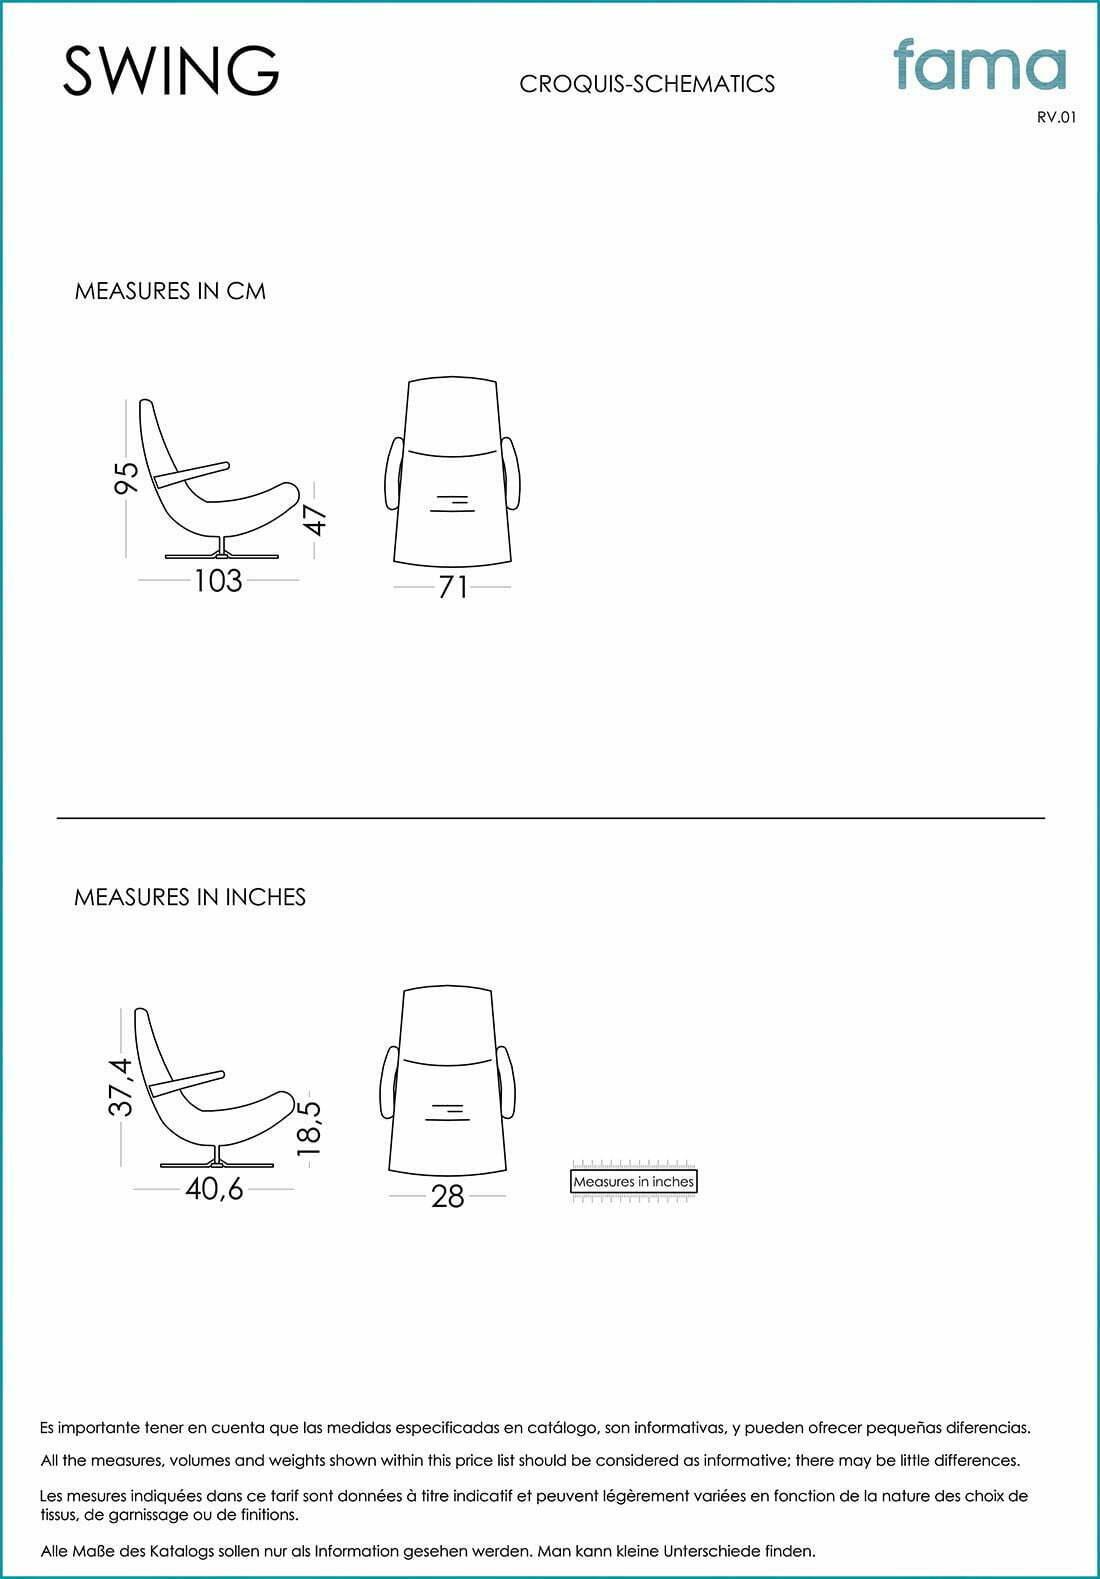 funky-armchair-swivel-base-famaliving-montreal-swing-specification-sheet